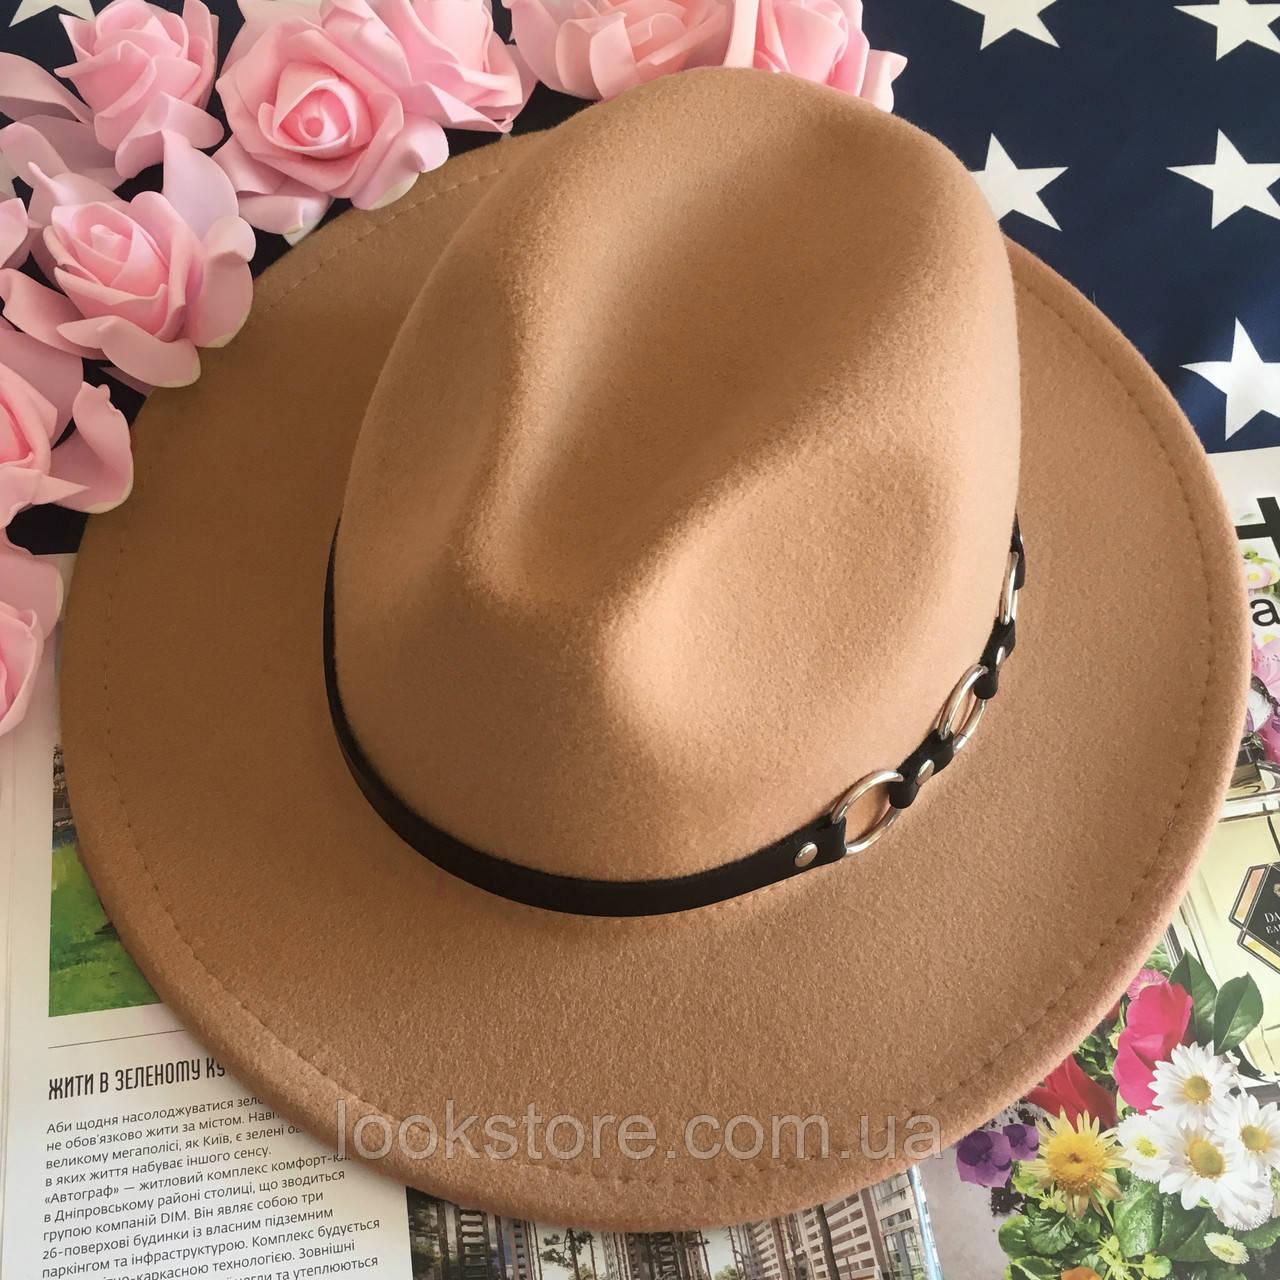 Шляпа Федора унисекс с устойчивыми полями Rings бежевая